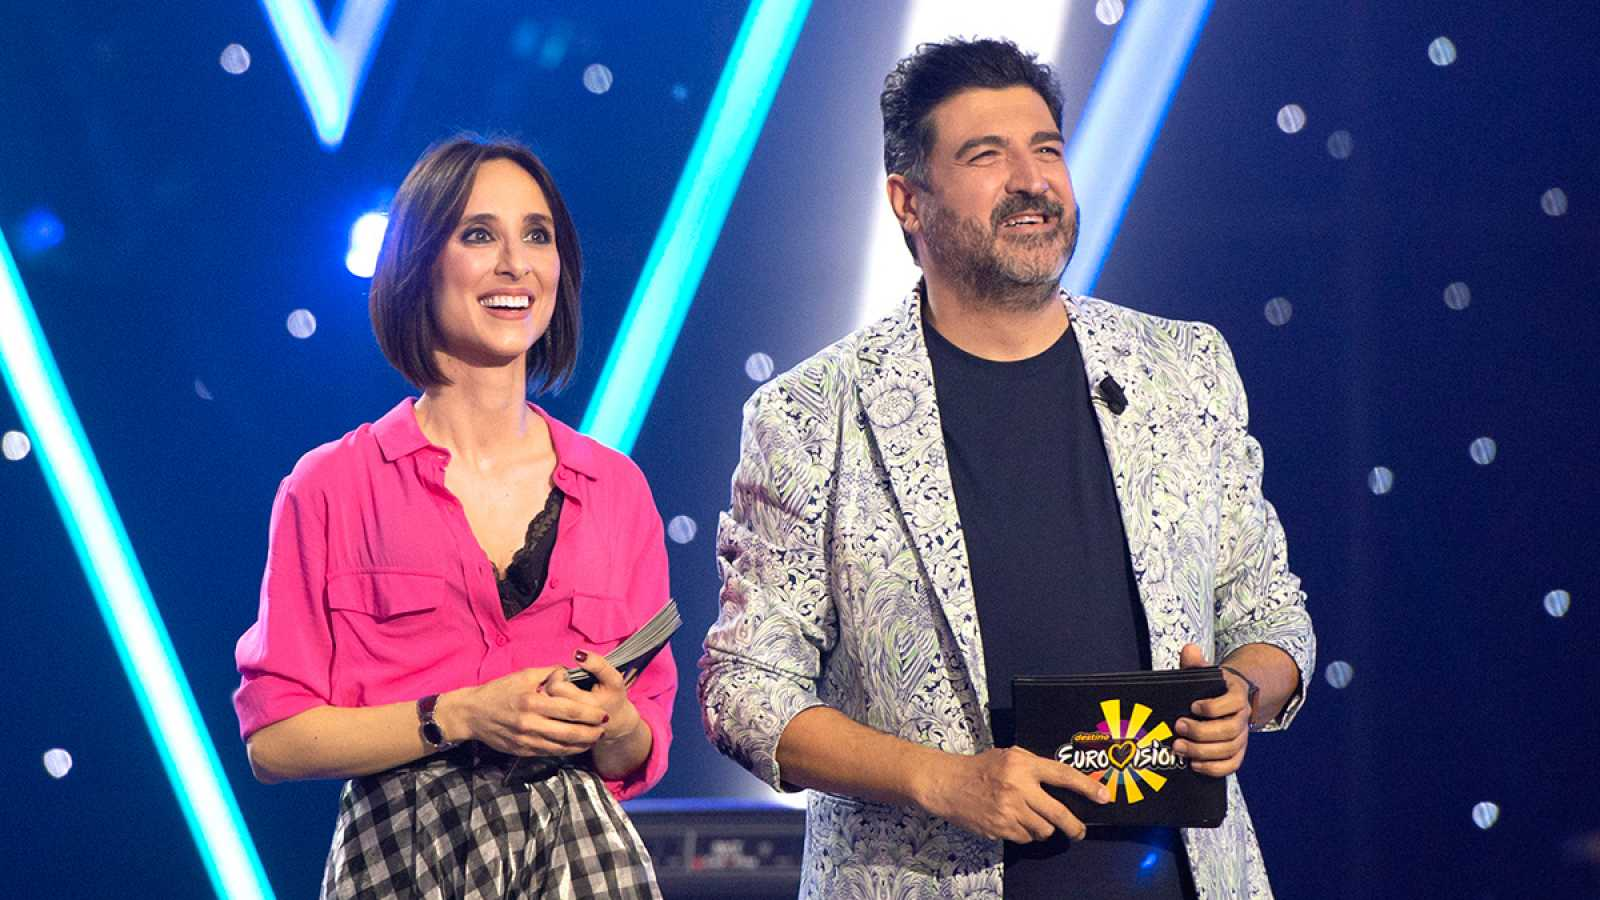 Tony Aguilar y Julia Varela comentarán Eurovisión 2021 desde Róterdam